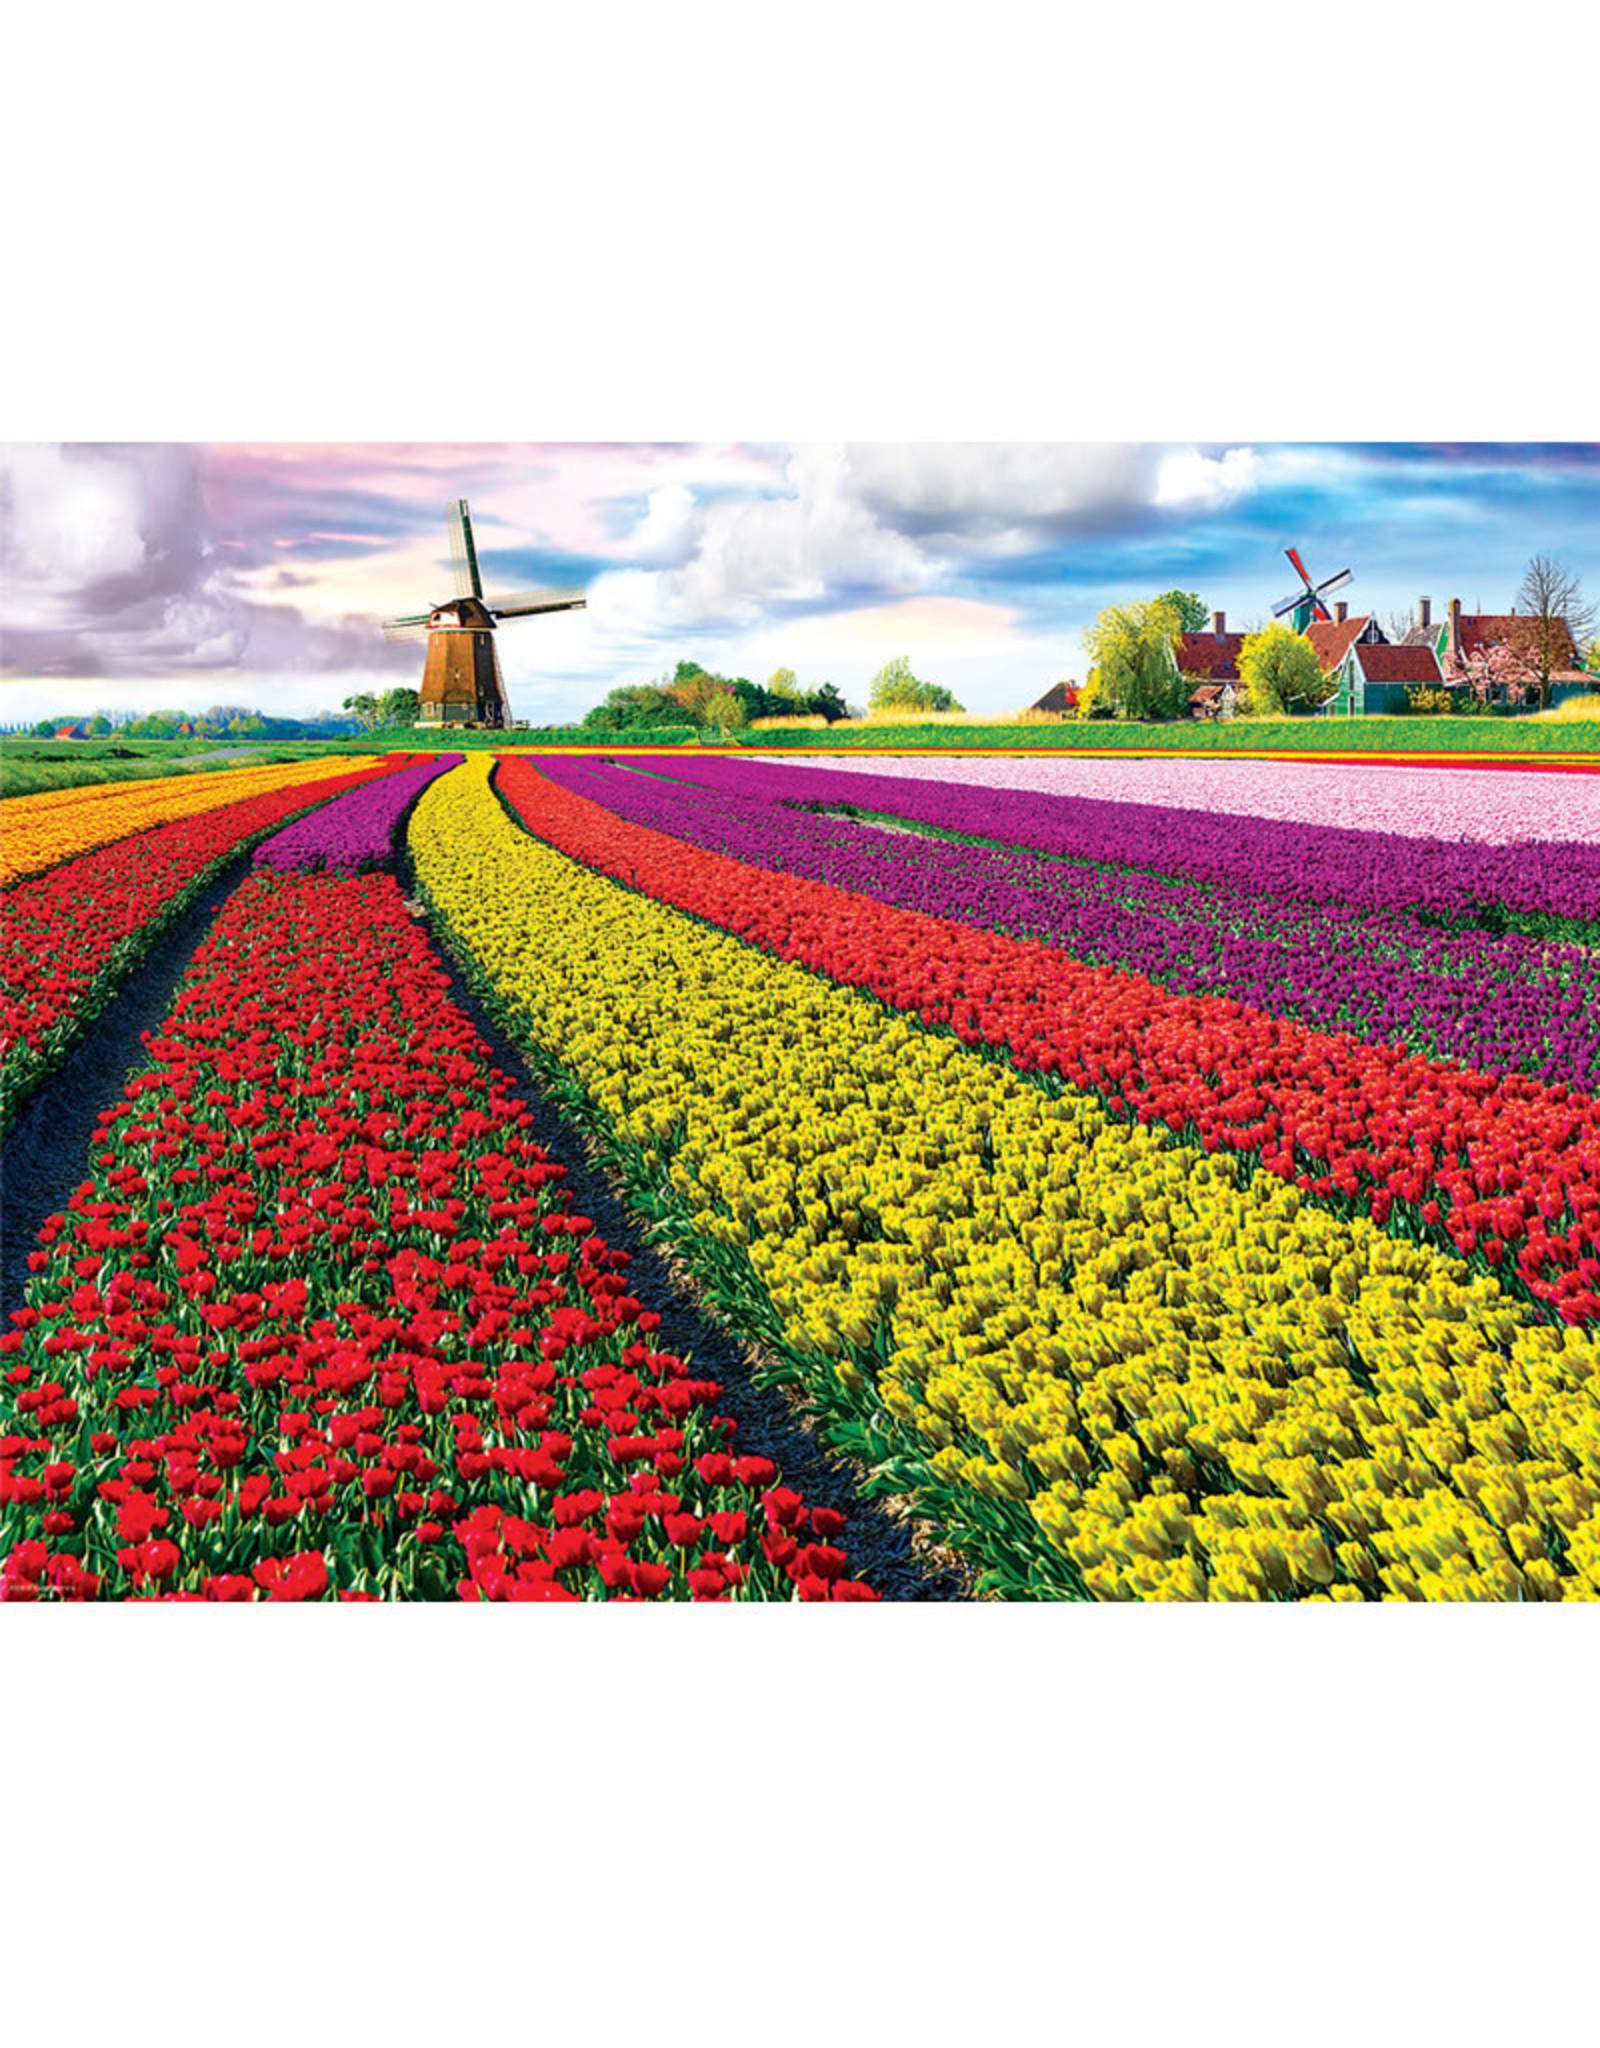 Eurographics Tulip Field - Netherlands Puzzle 1000 PCS